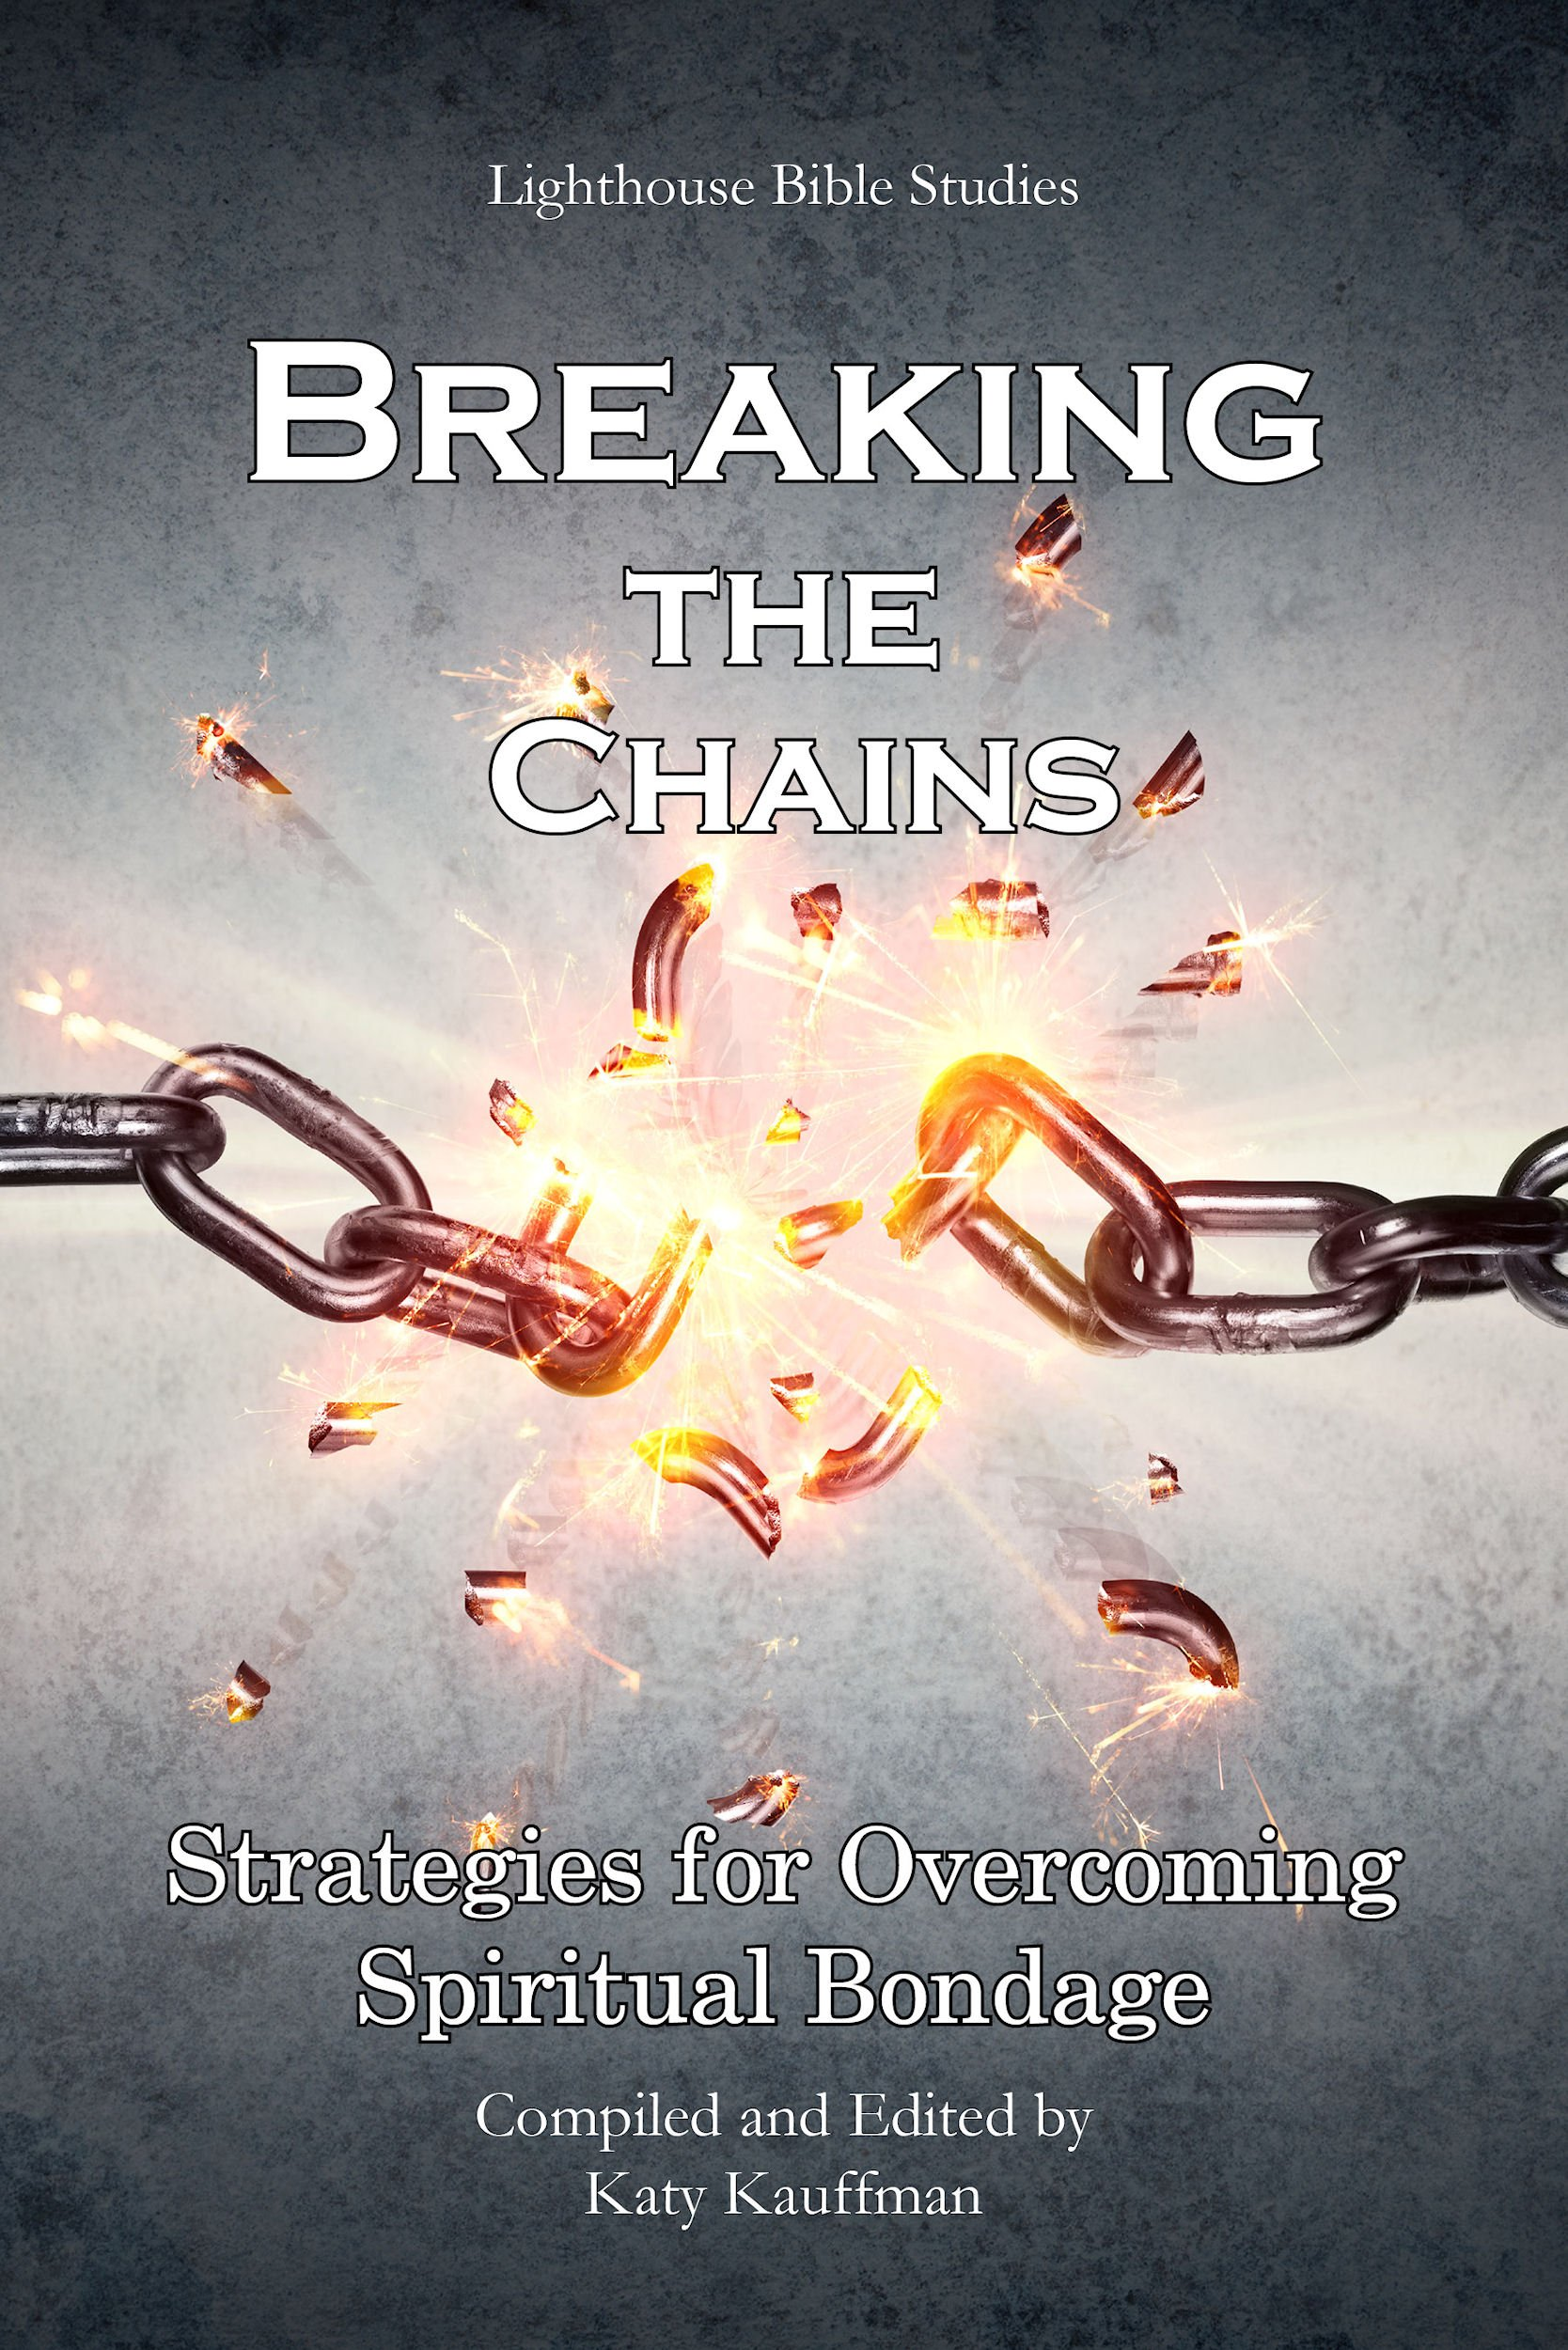 Christian overcoming bondages